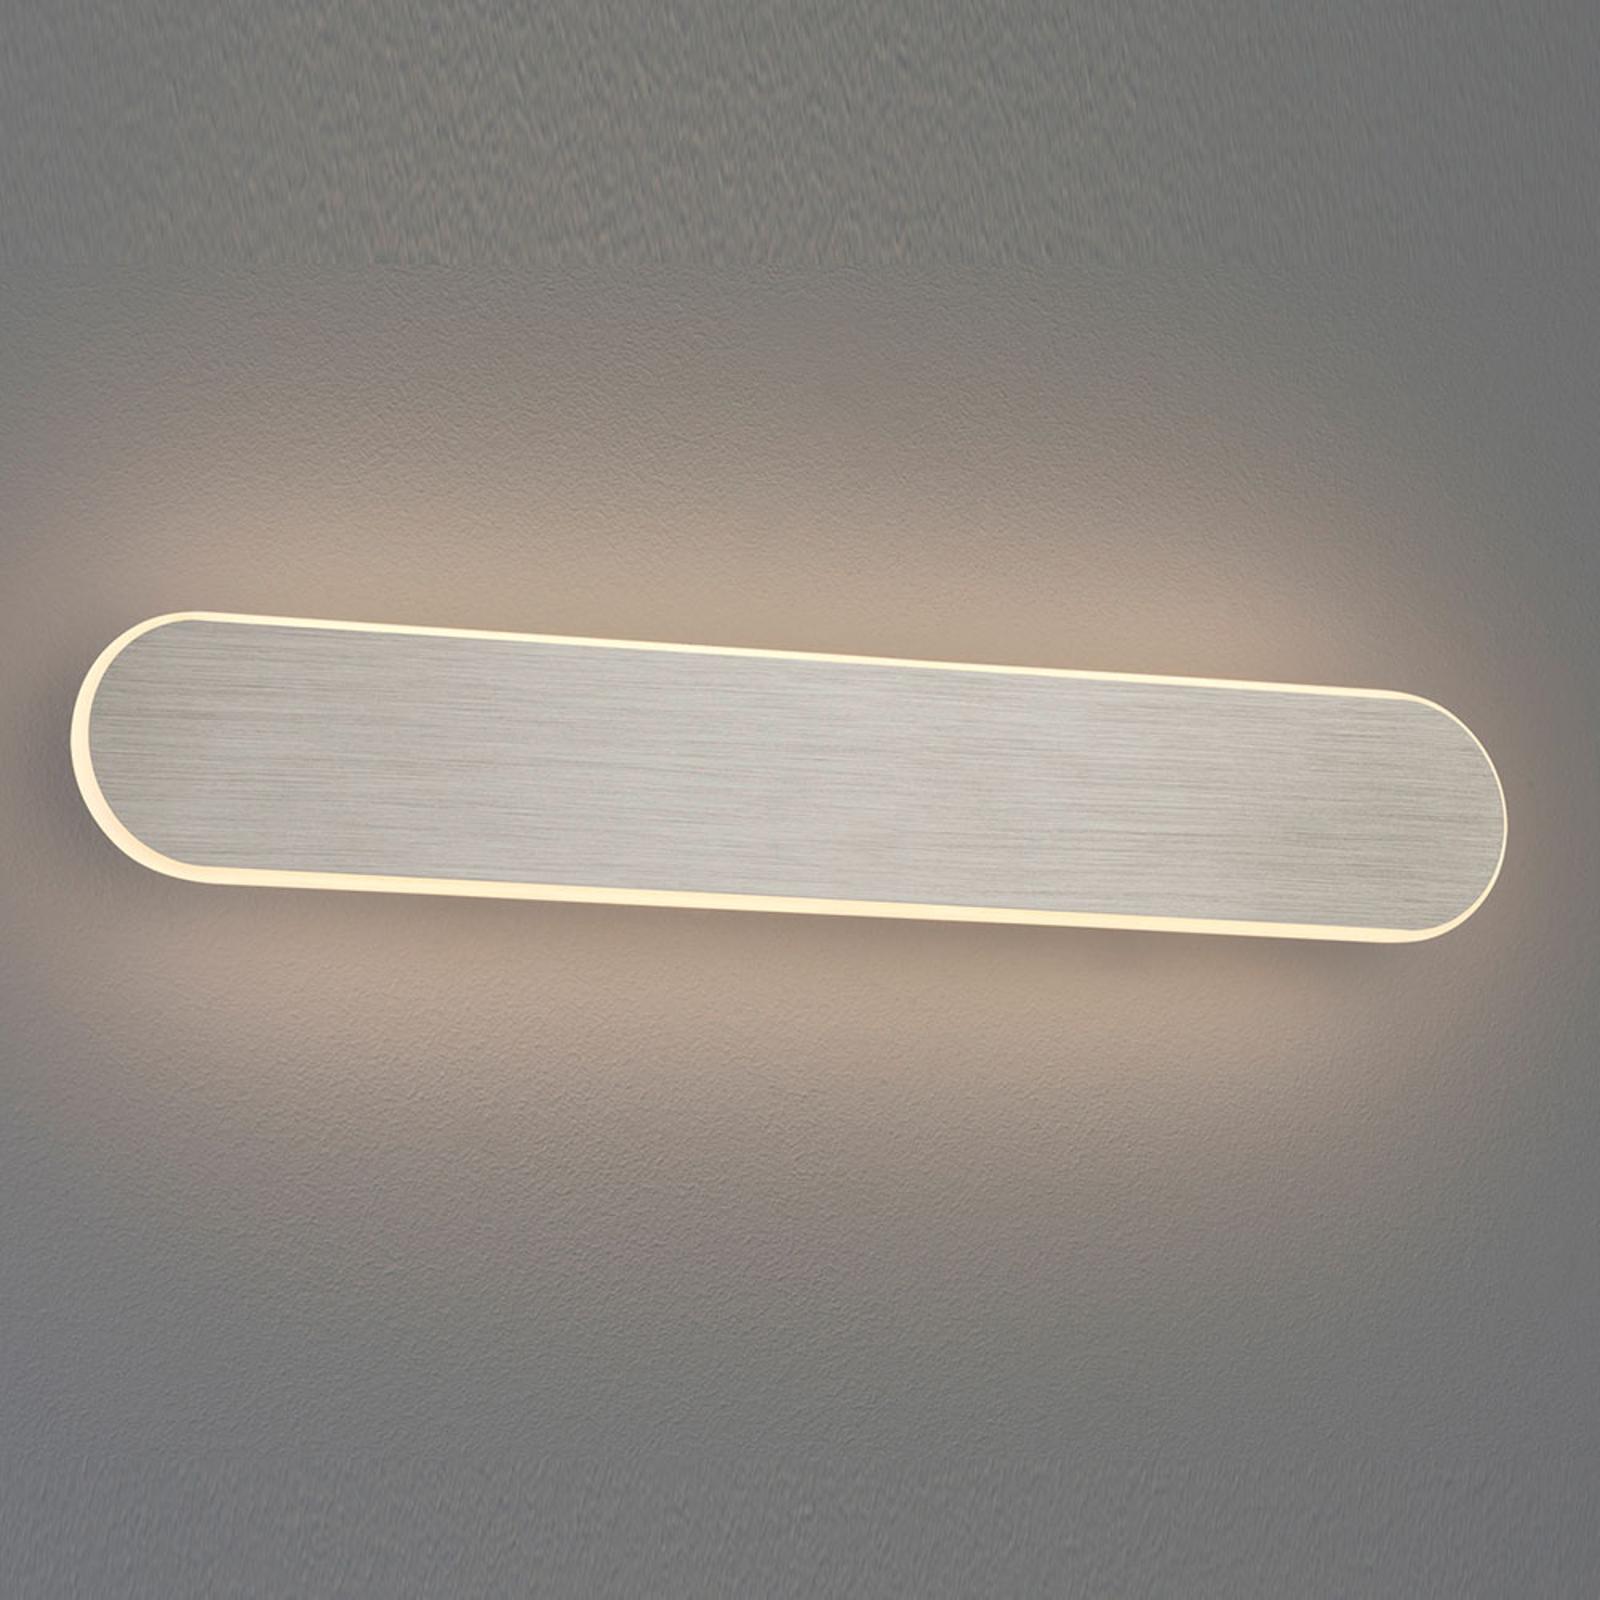 LED wandlamp Carlo, SwitchDim, 50 cm, nikkel mat